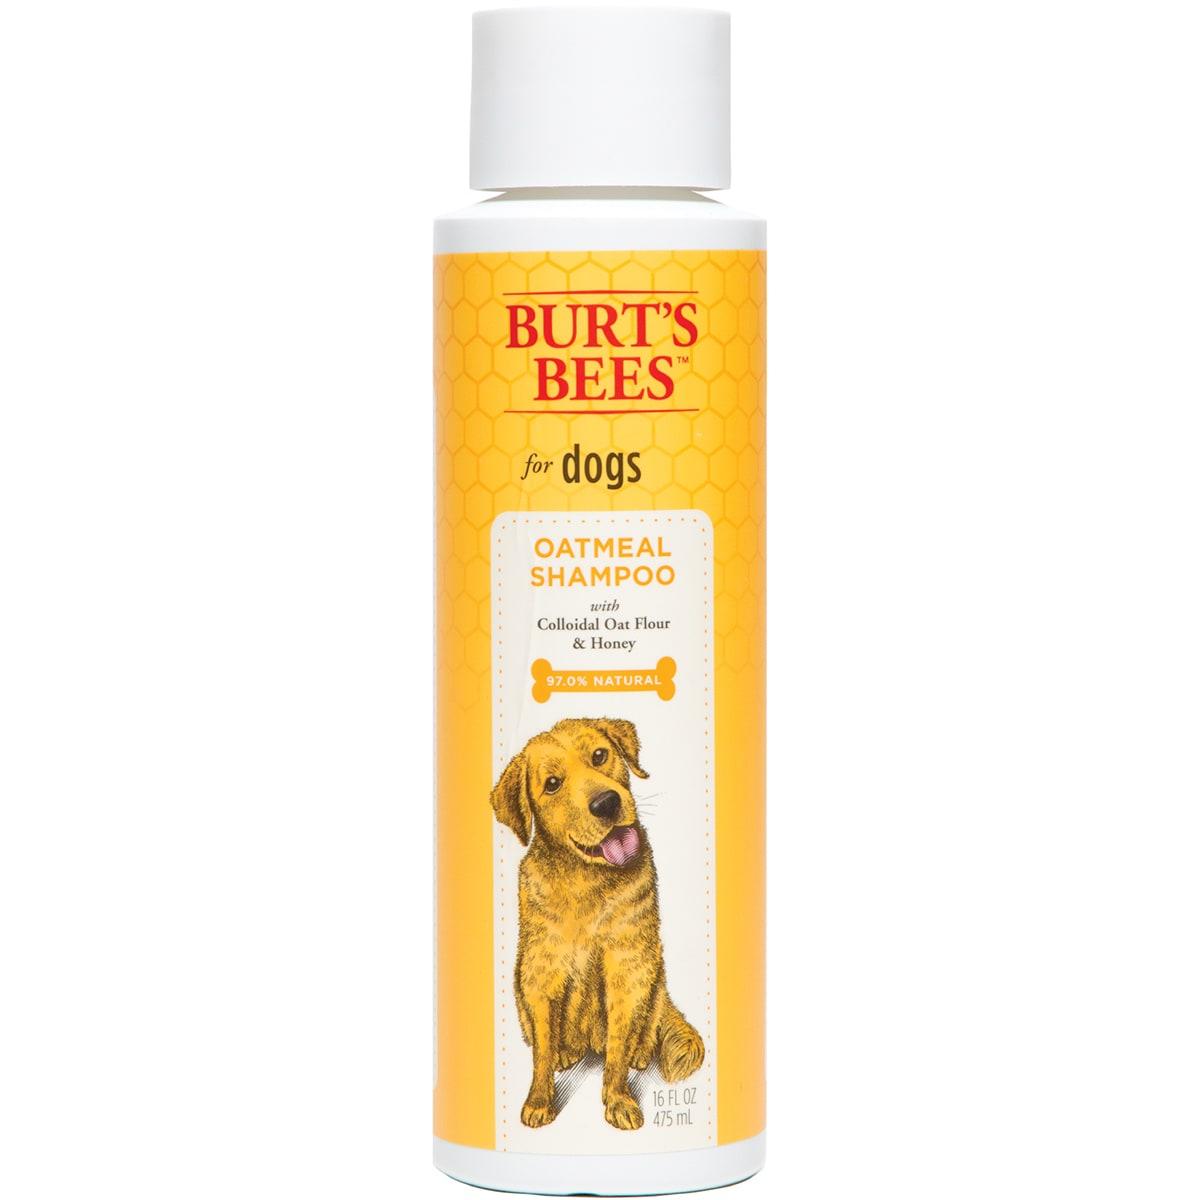 Burt's Bee's Dog Shampoo 16oz (Oatmeal), Grey